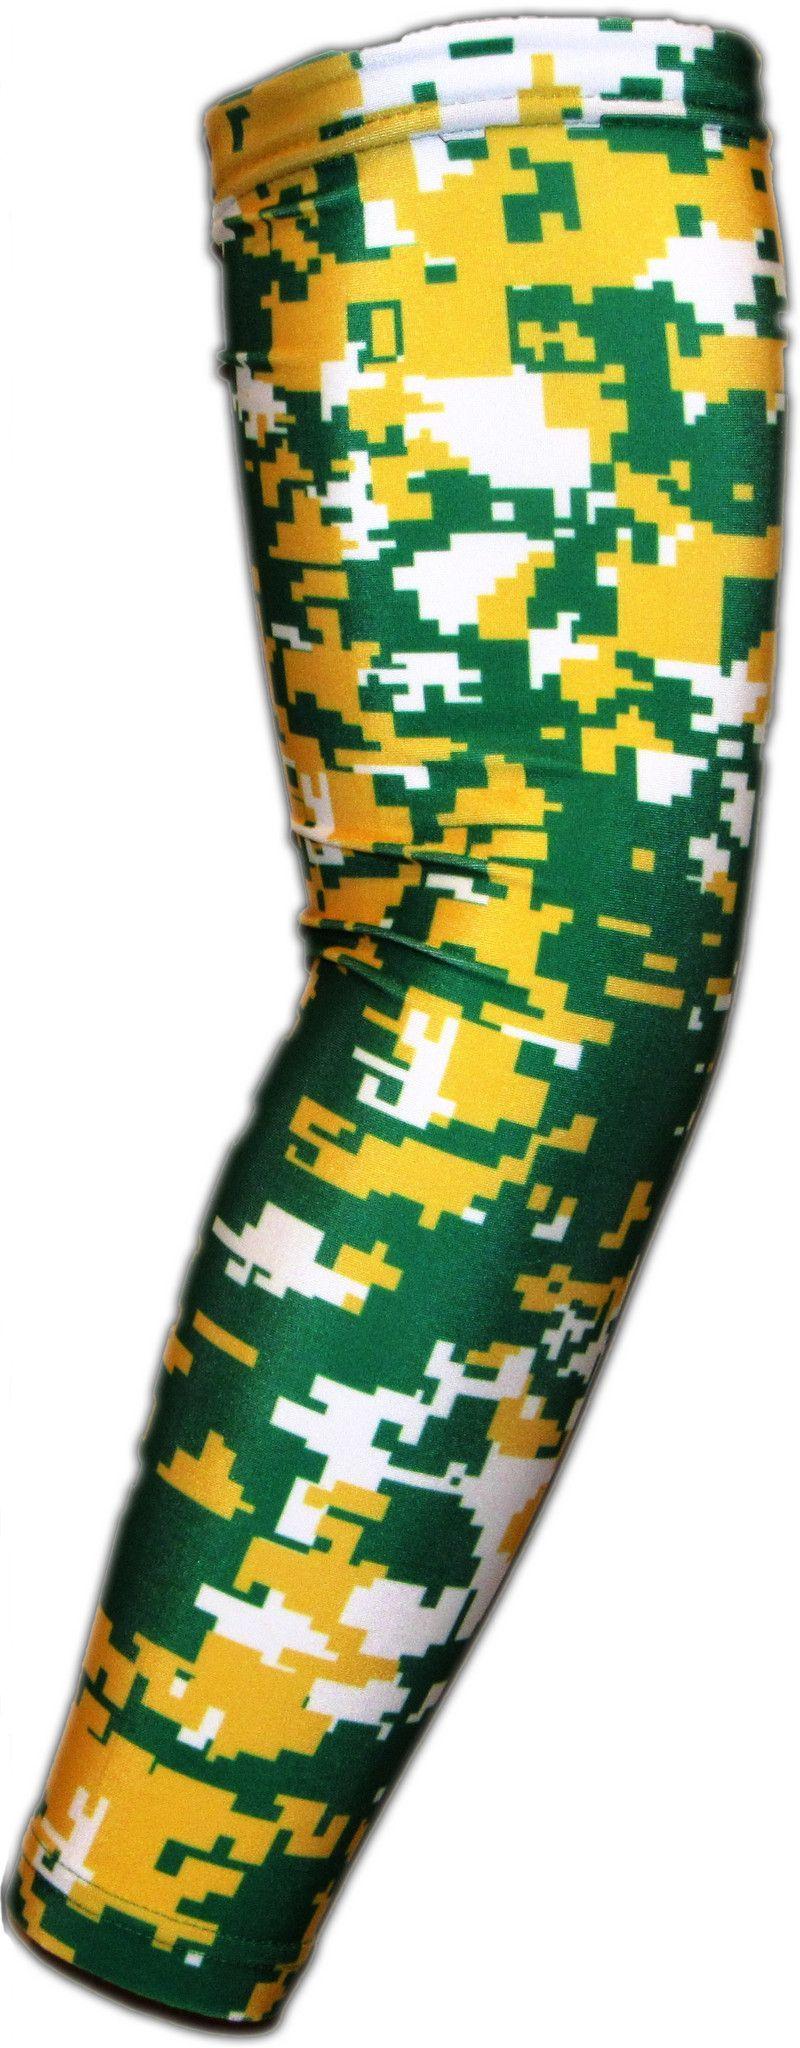 001 White Green Yellow Arm Sleeves